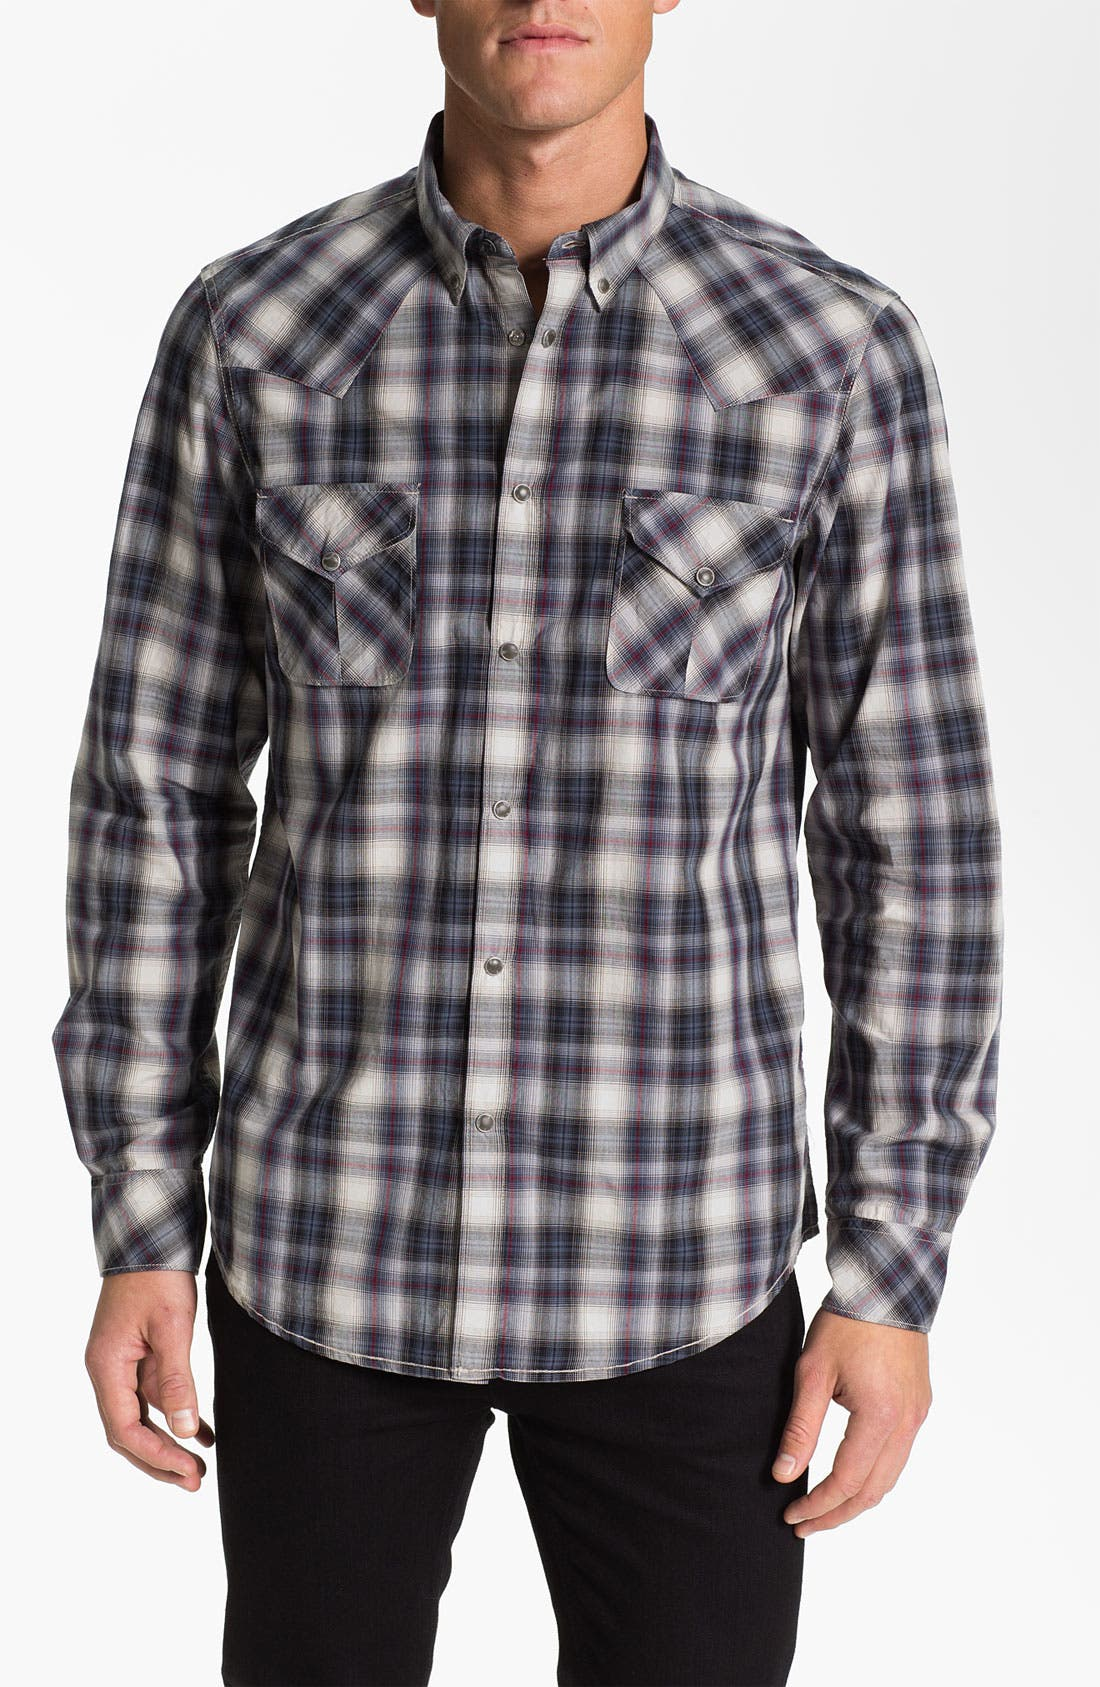 Main Image - Ben Sherman 'Clerkenwell' Plaid Woven Shirt